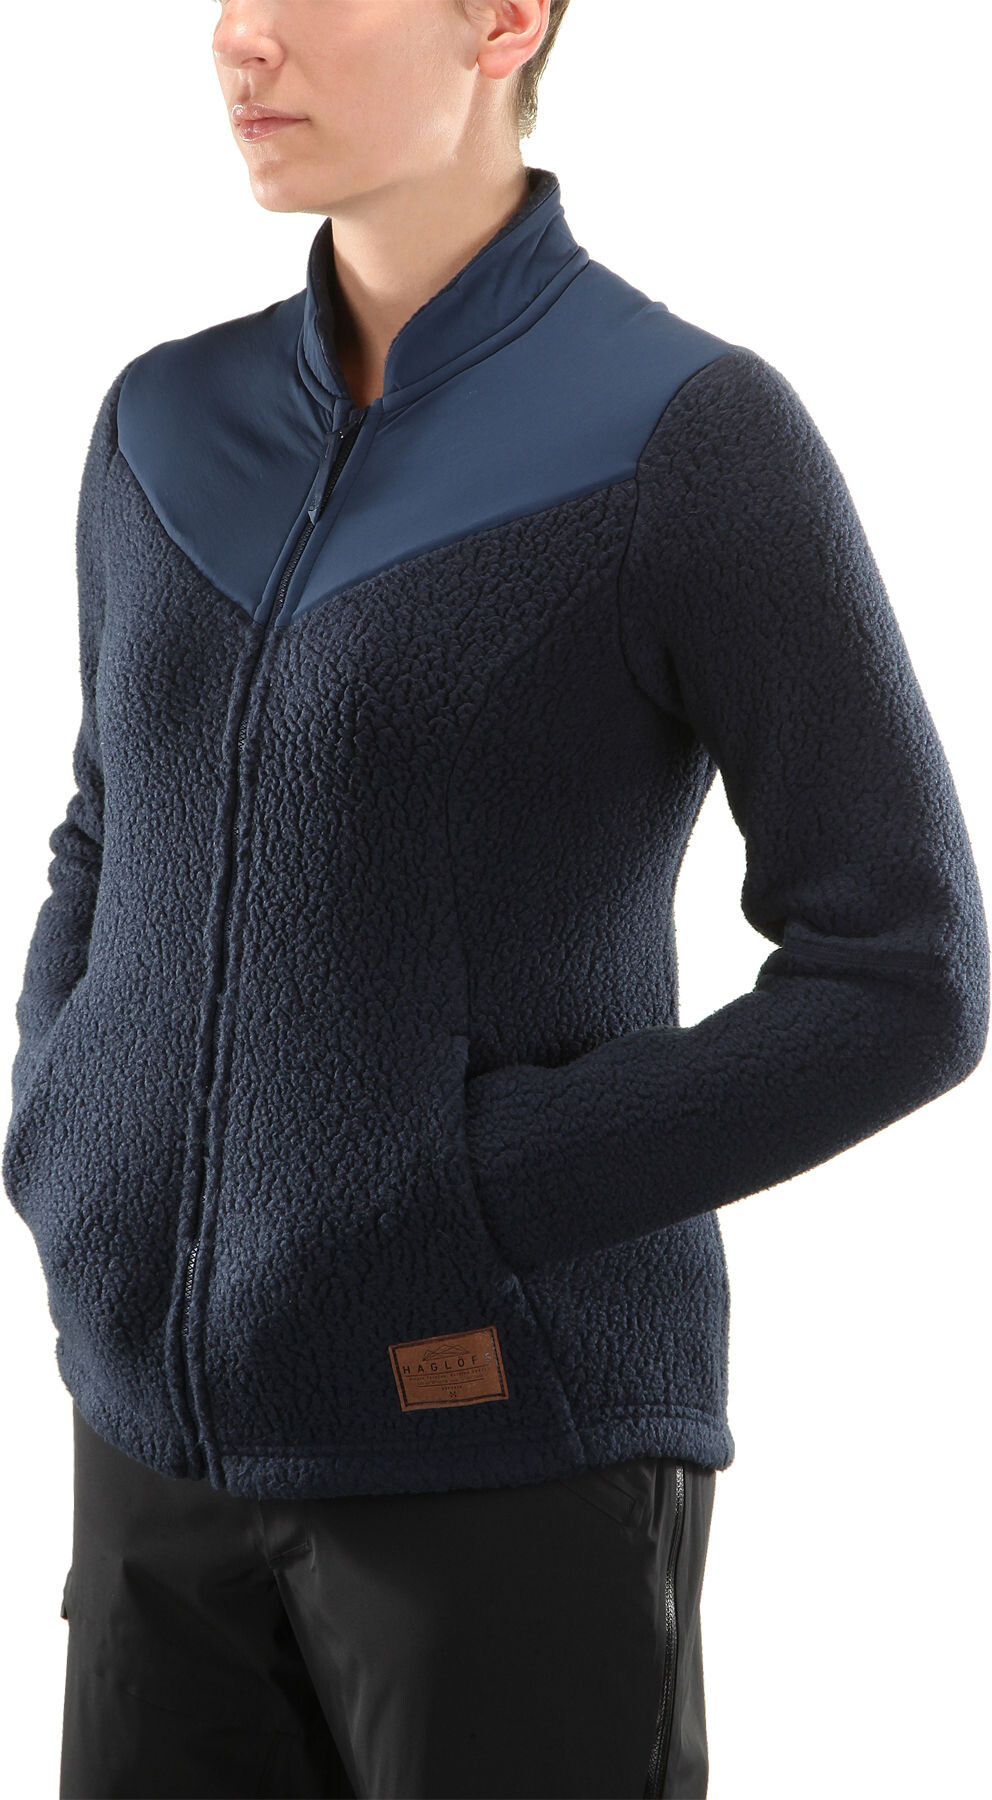 Haglöfs W s Pile Jacket Deep blue Tarn blue - addnature.com 2015410348578